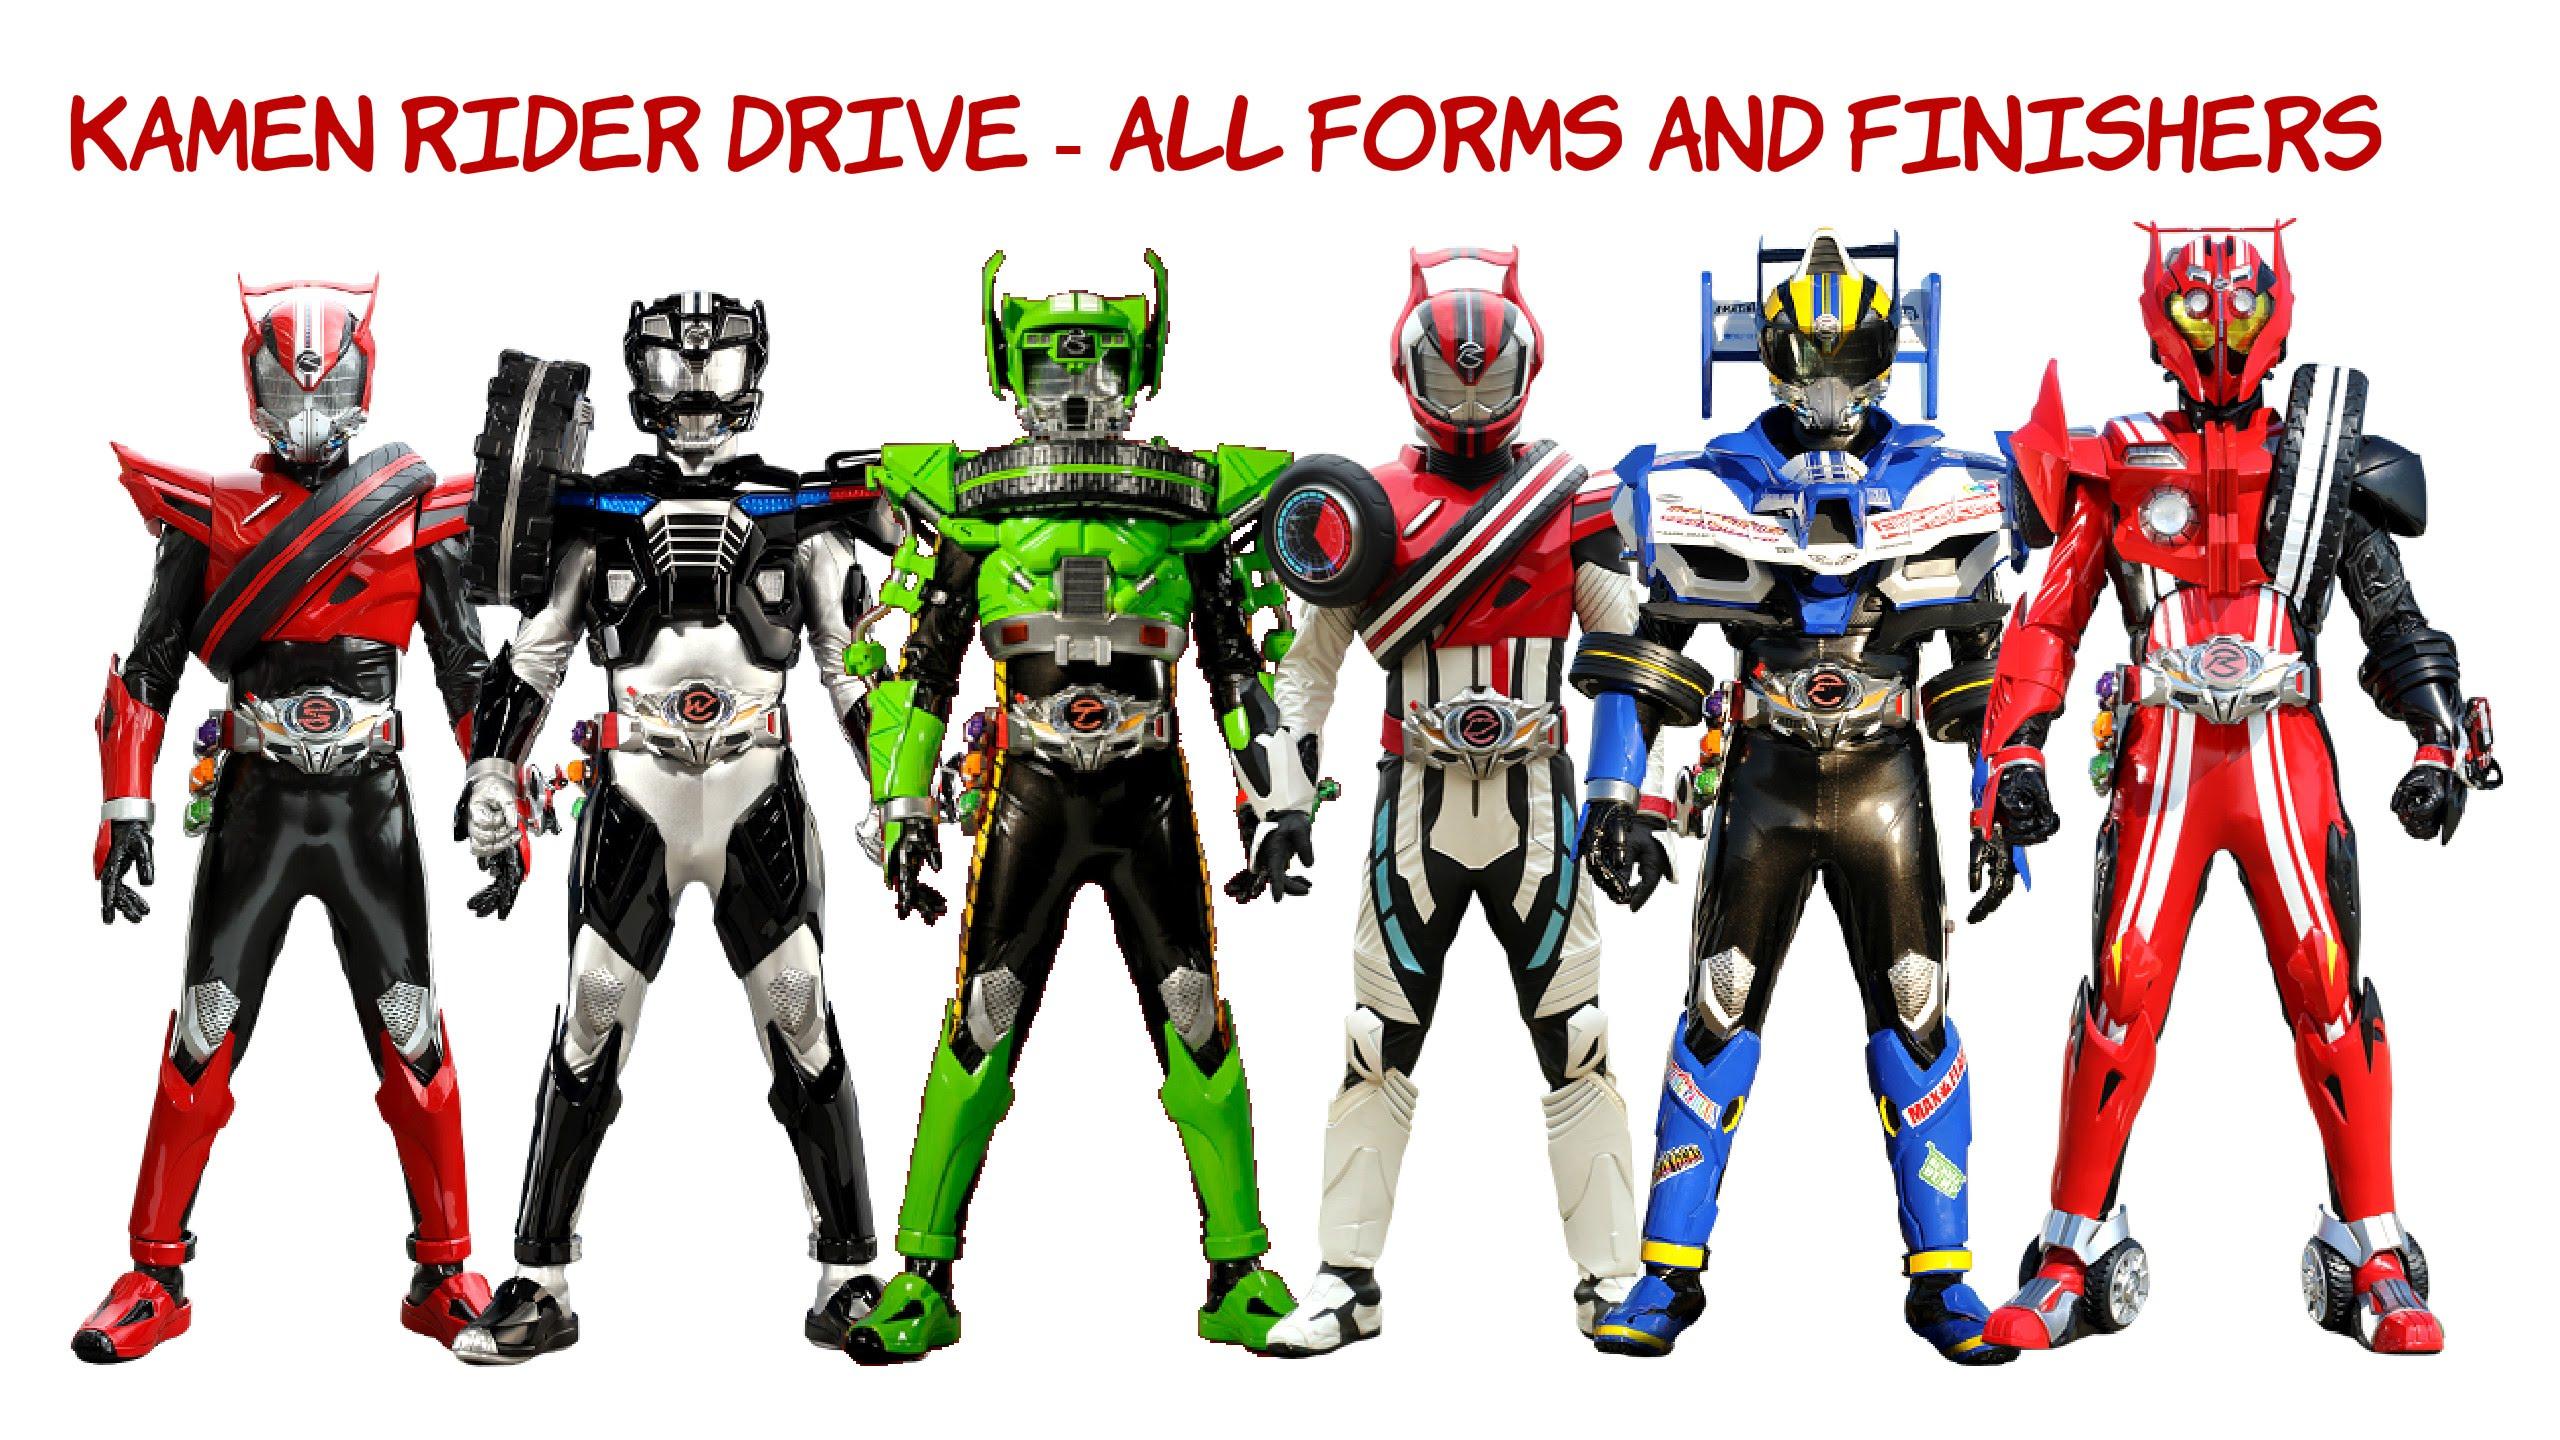 Kamen Rider wallpapers, TV Show, HQ Kamen Rider pictures